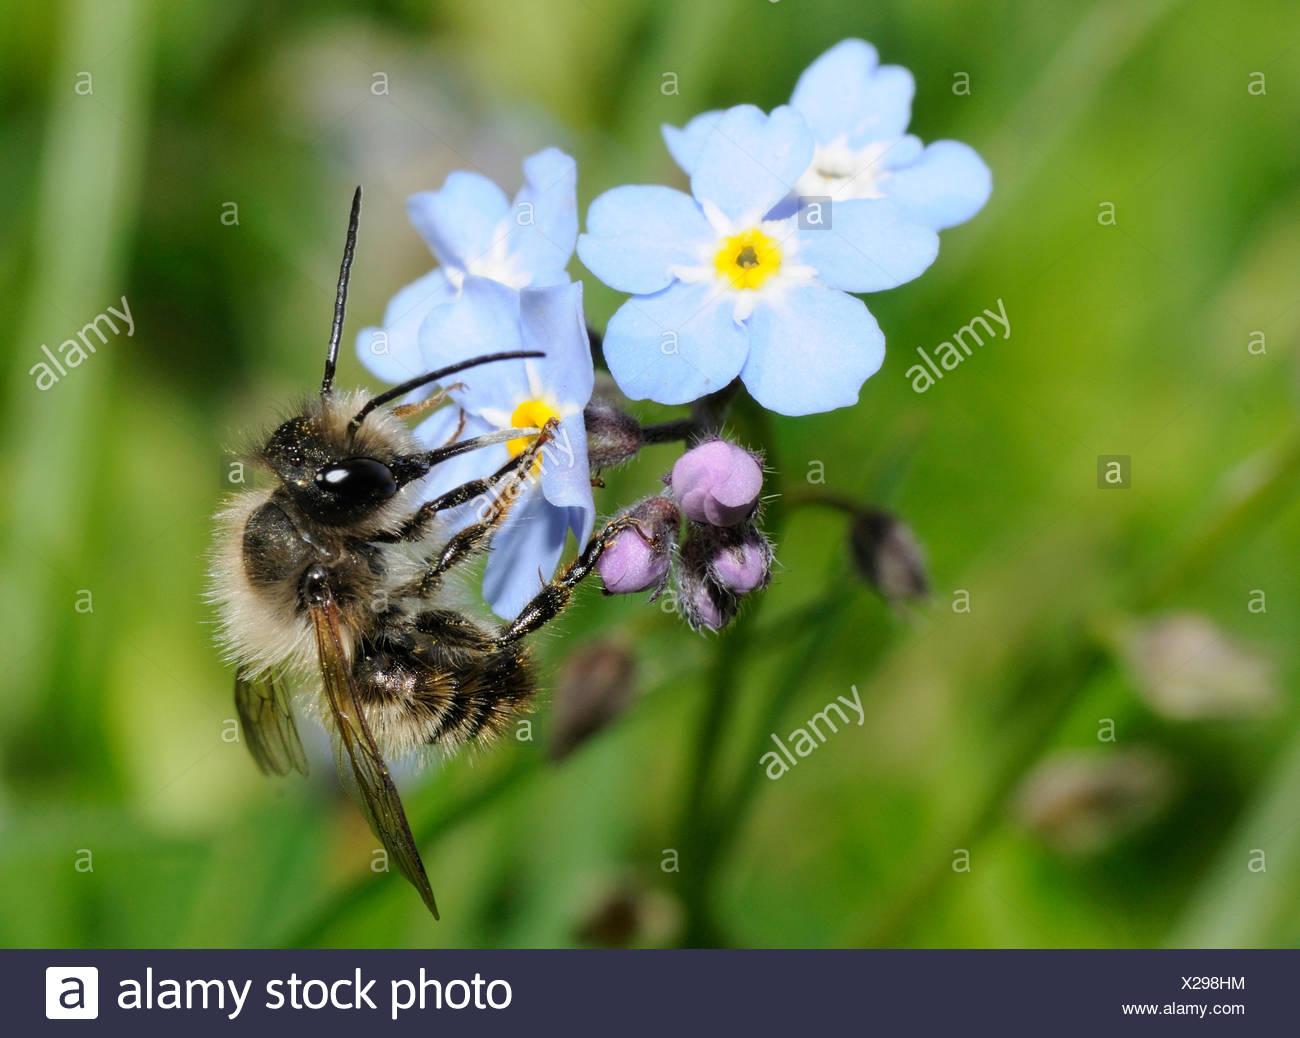 Red Mason Bee on Myosotis flowers - Northern Vosges France Stock Photo